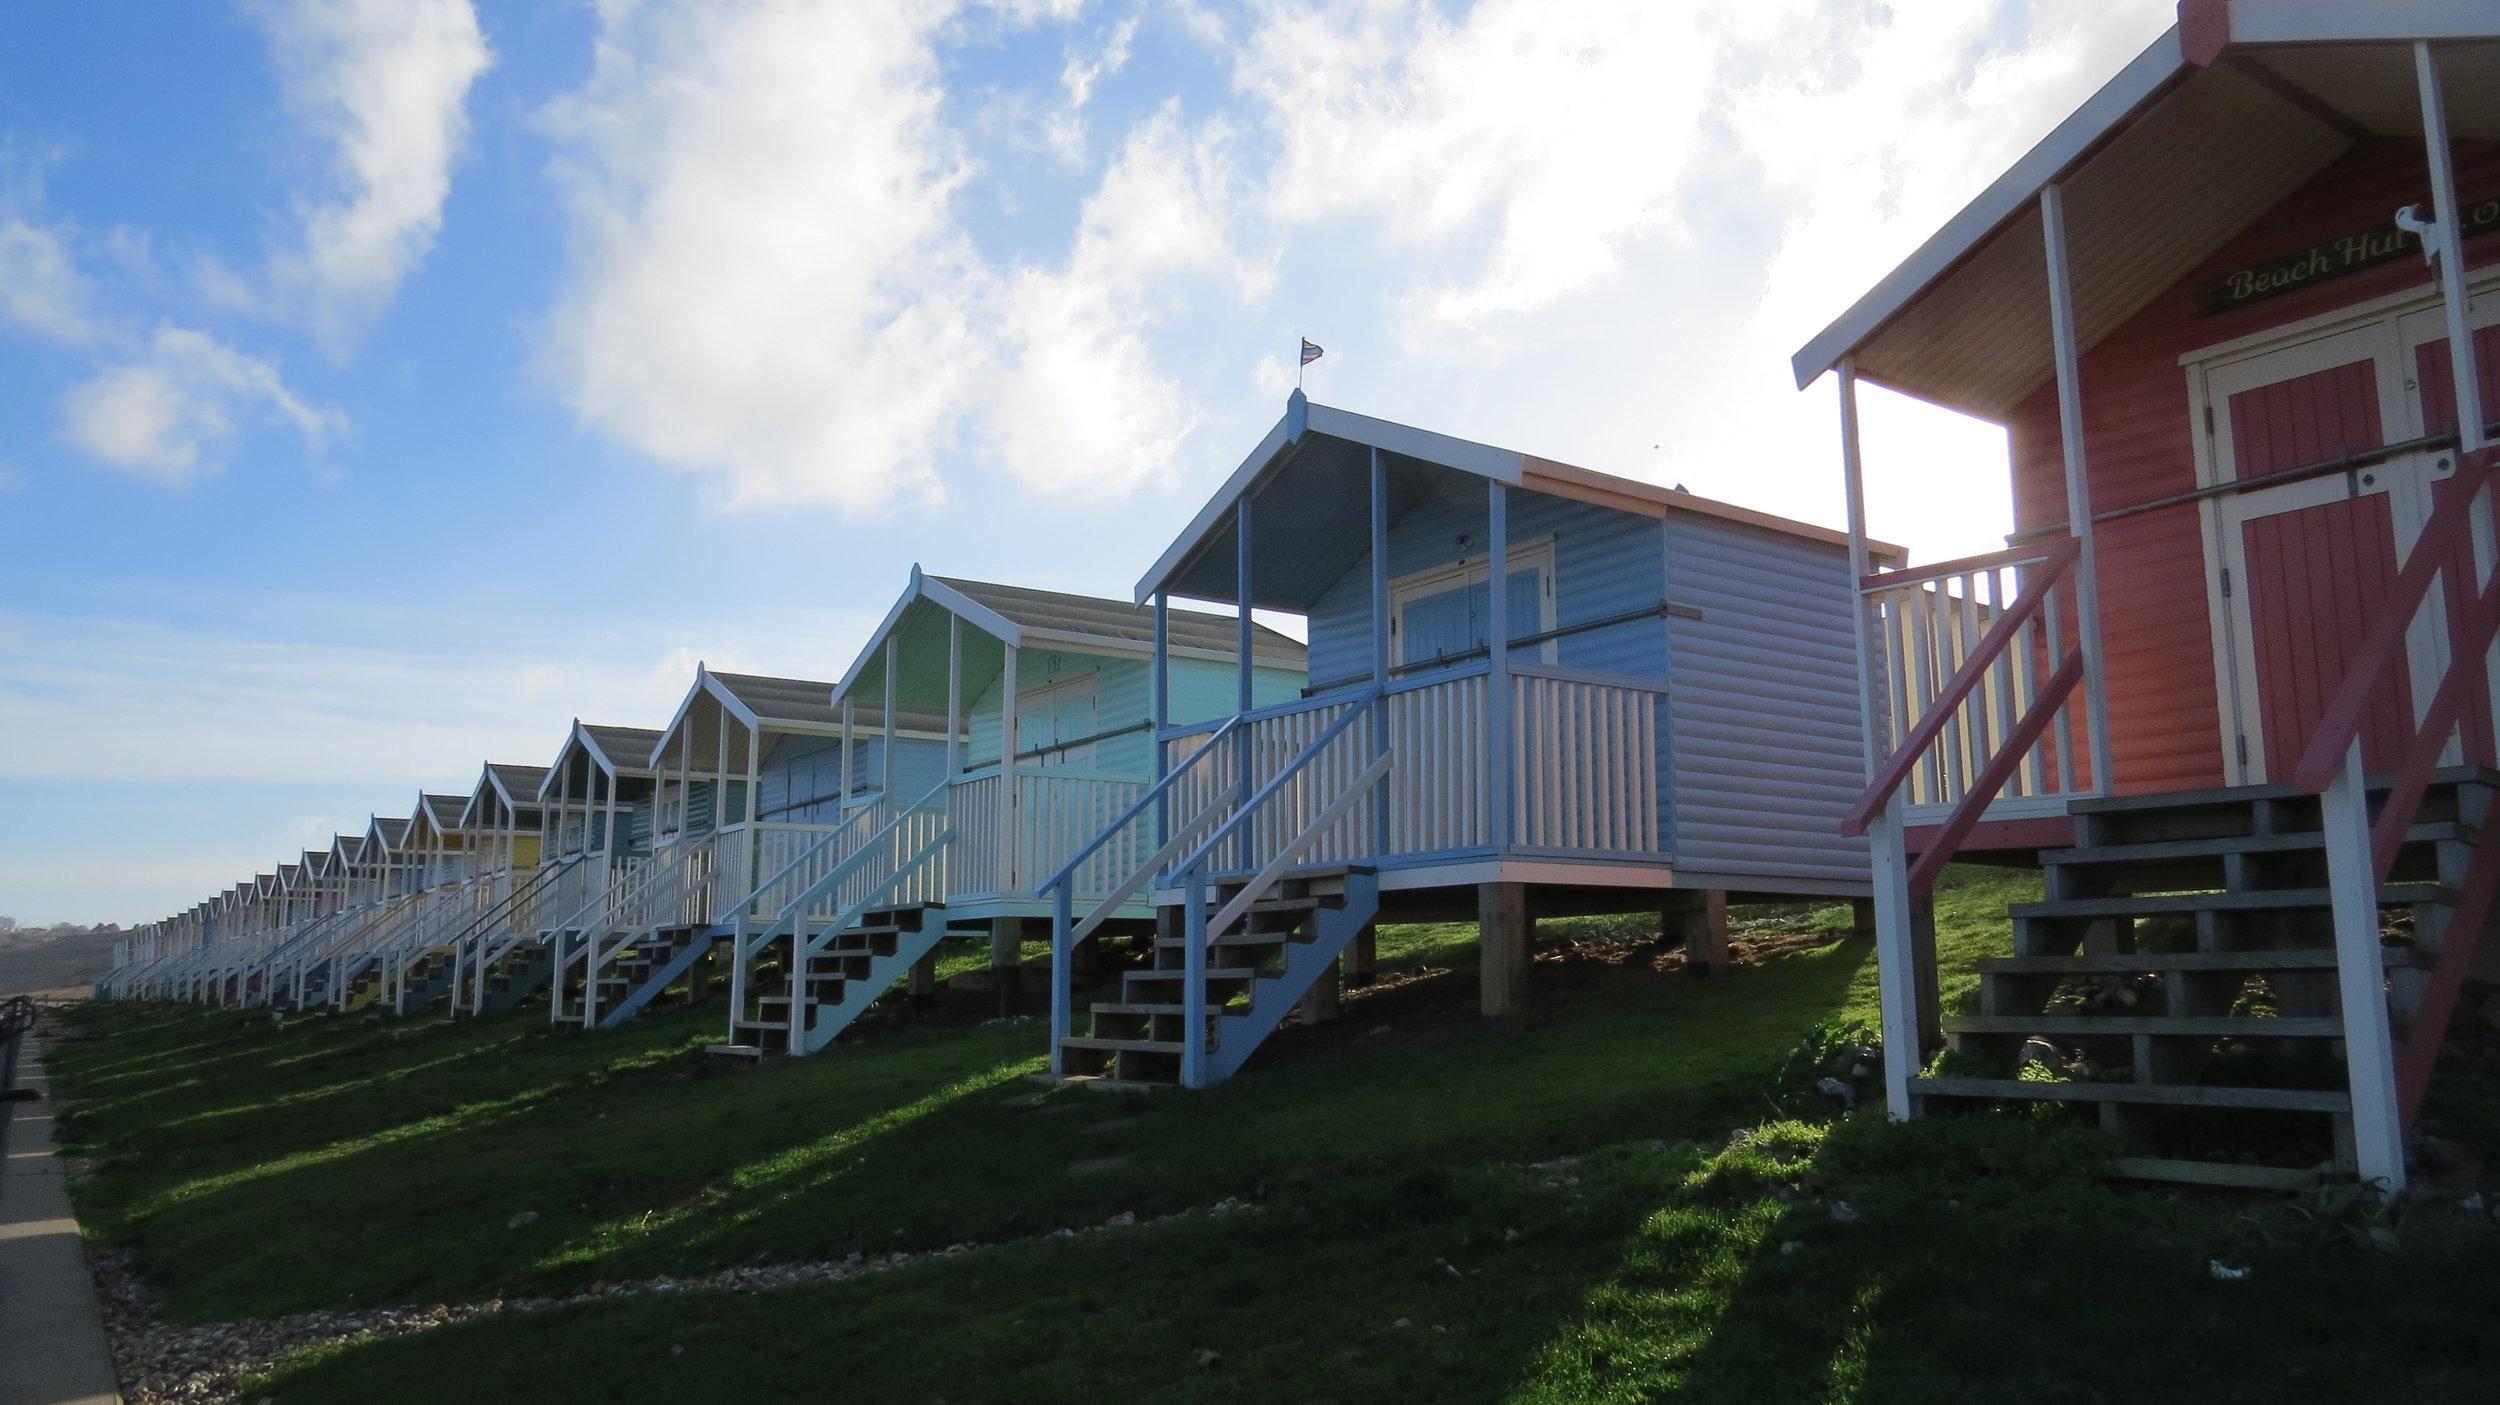 Minster Beach Huts